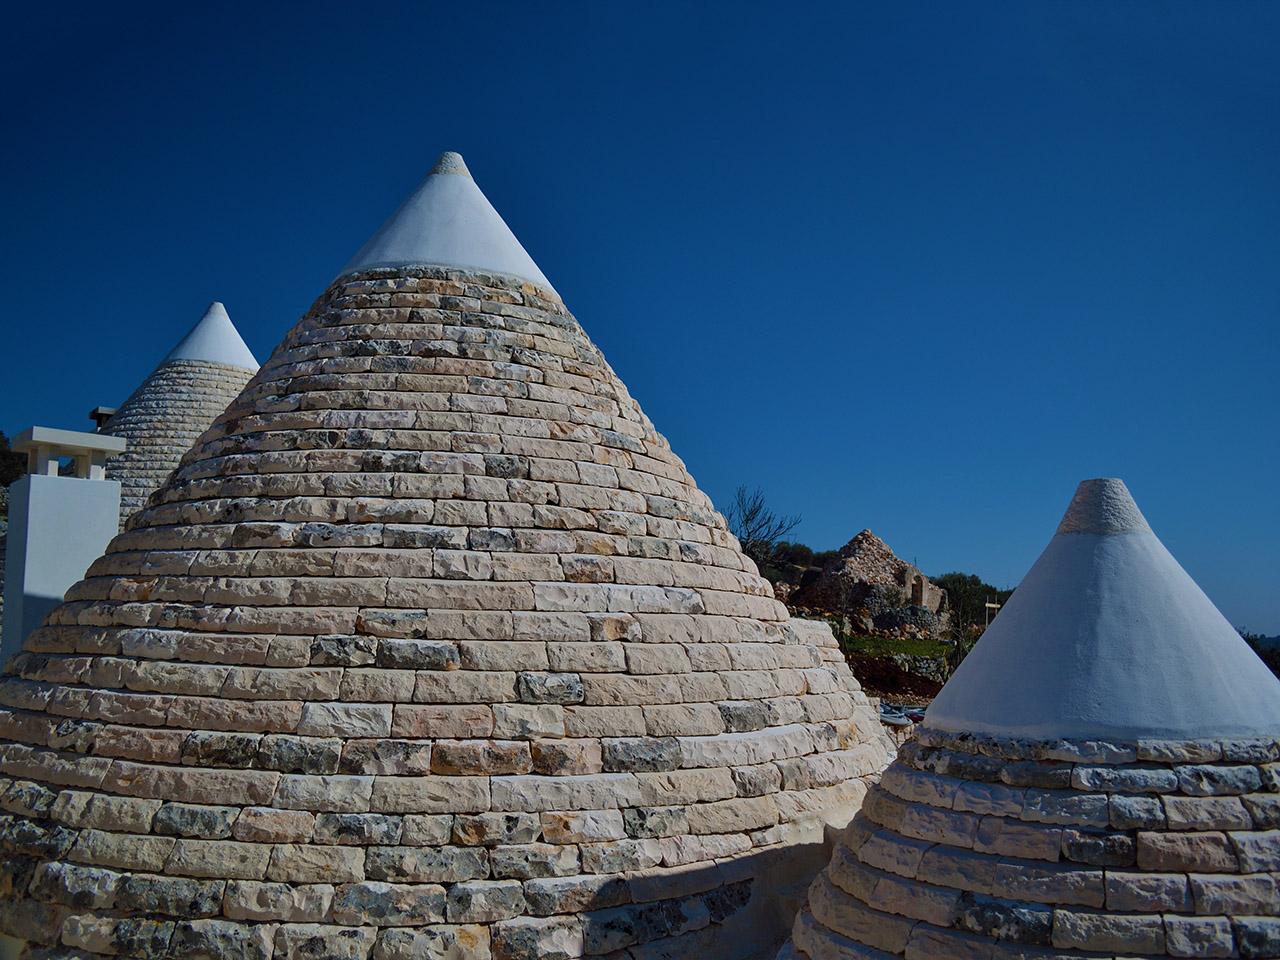 costruzioni restauri sirio ostuni residenza privata montesasso ostuni dsc 0079